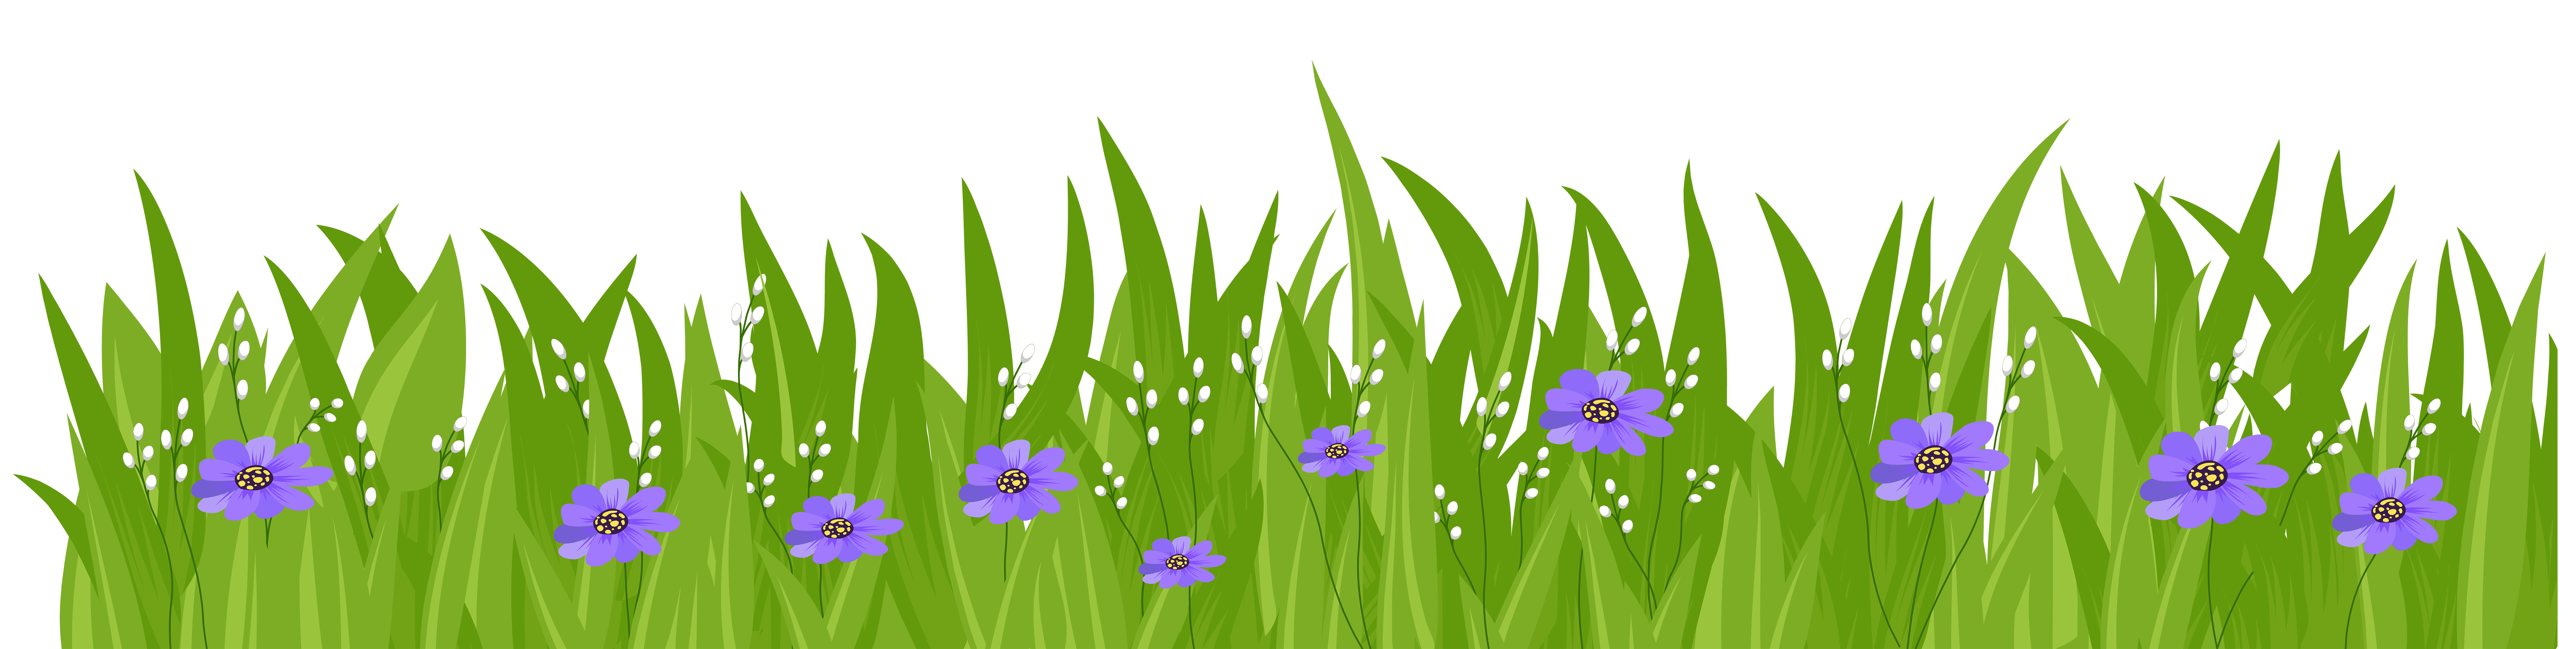 With purple flowers transparent. Flower clipart grass